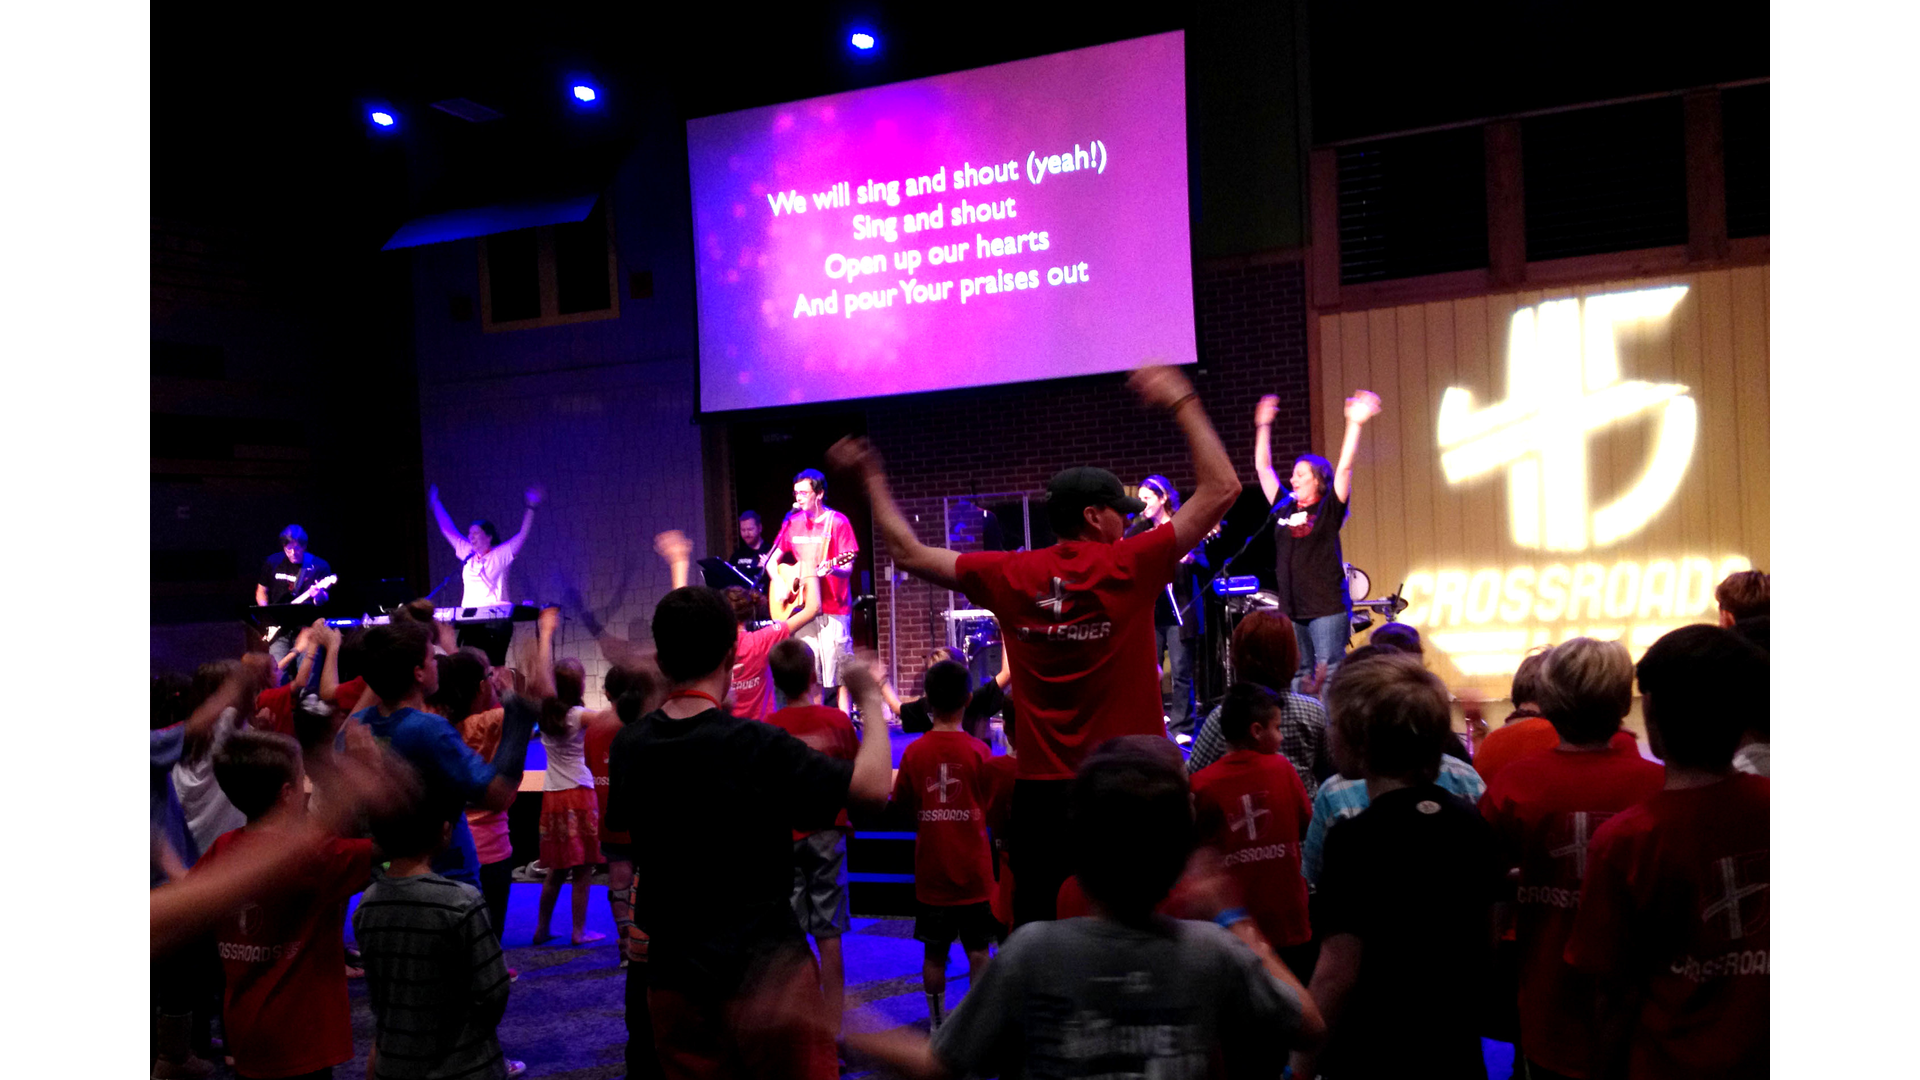 Worship God and Serve Your King! Hero Image